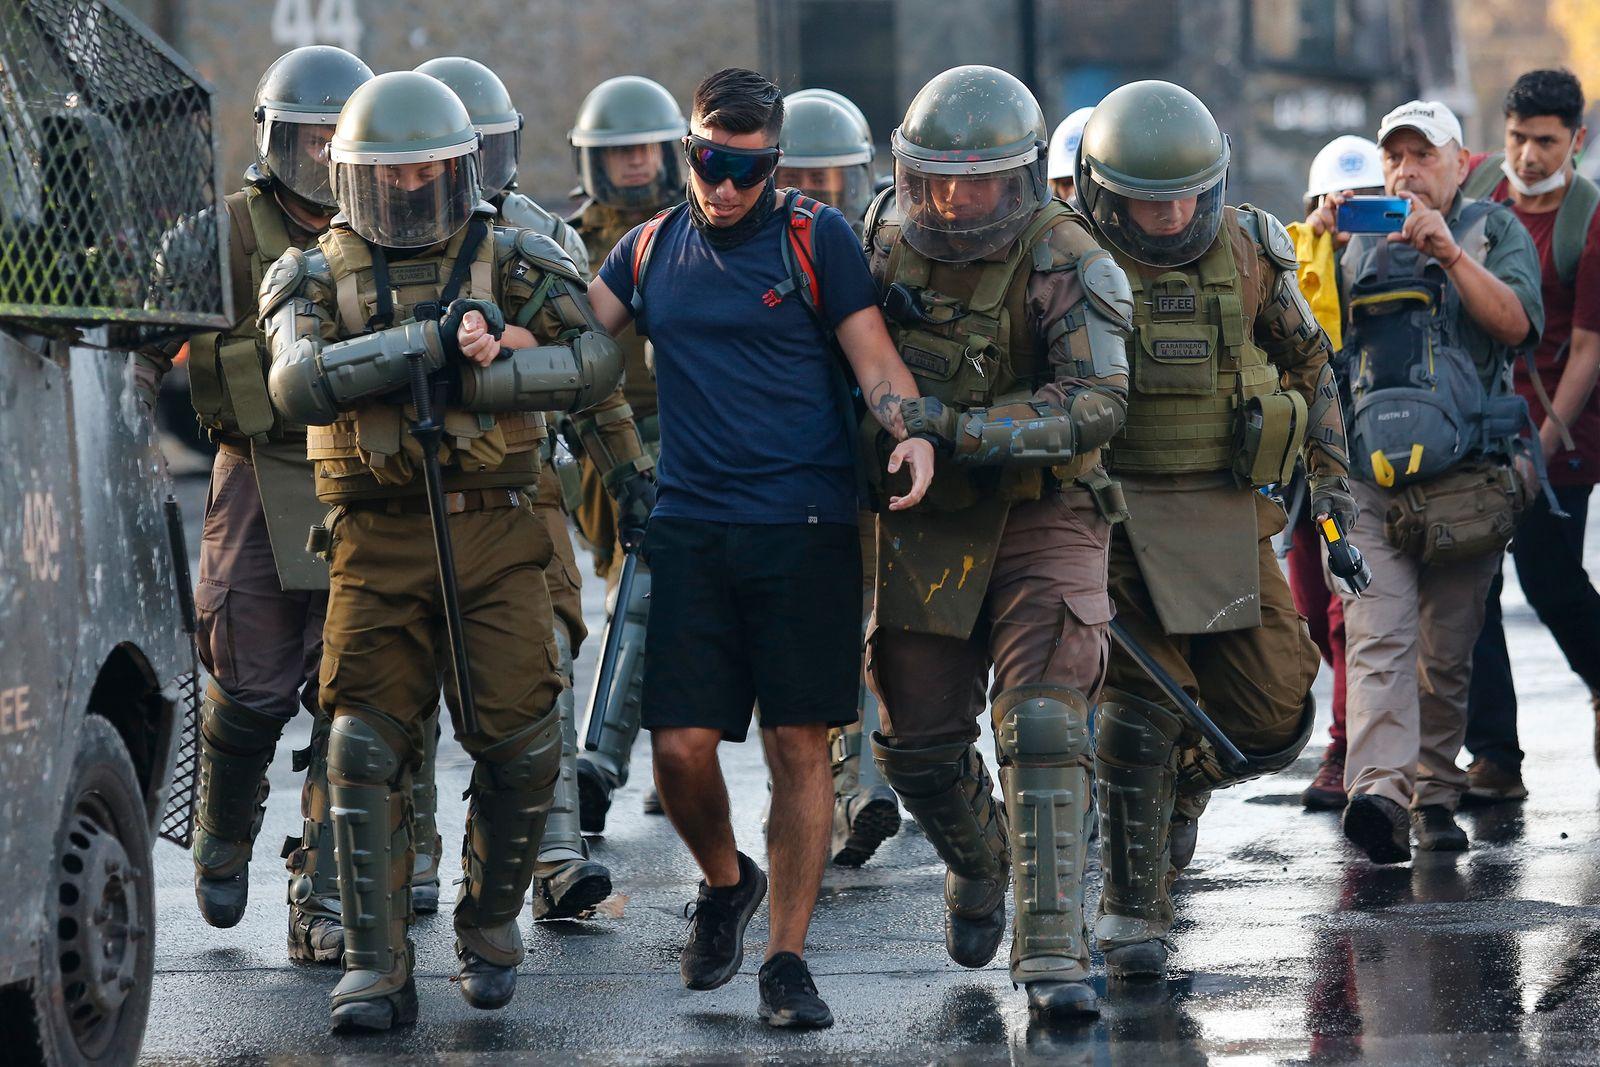 Demonstrations Resurface in Santiago Despite the Coronavirus Emergency